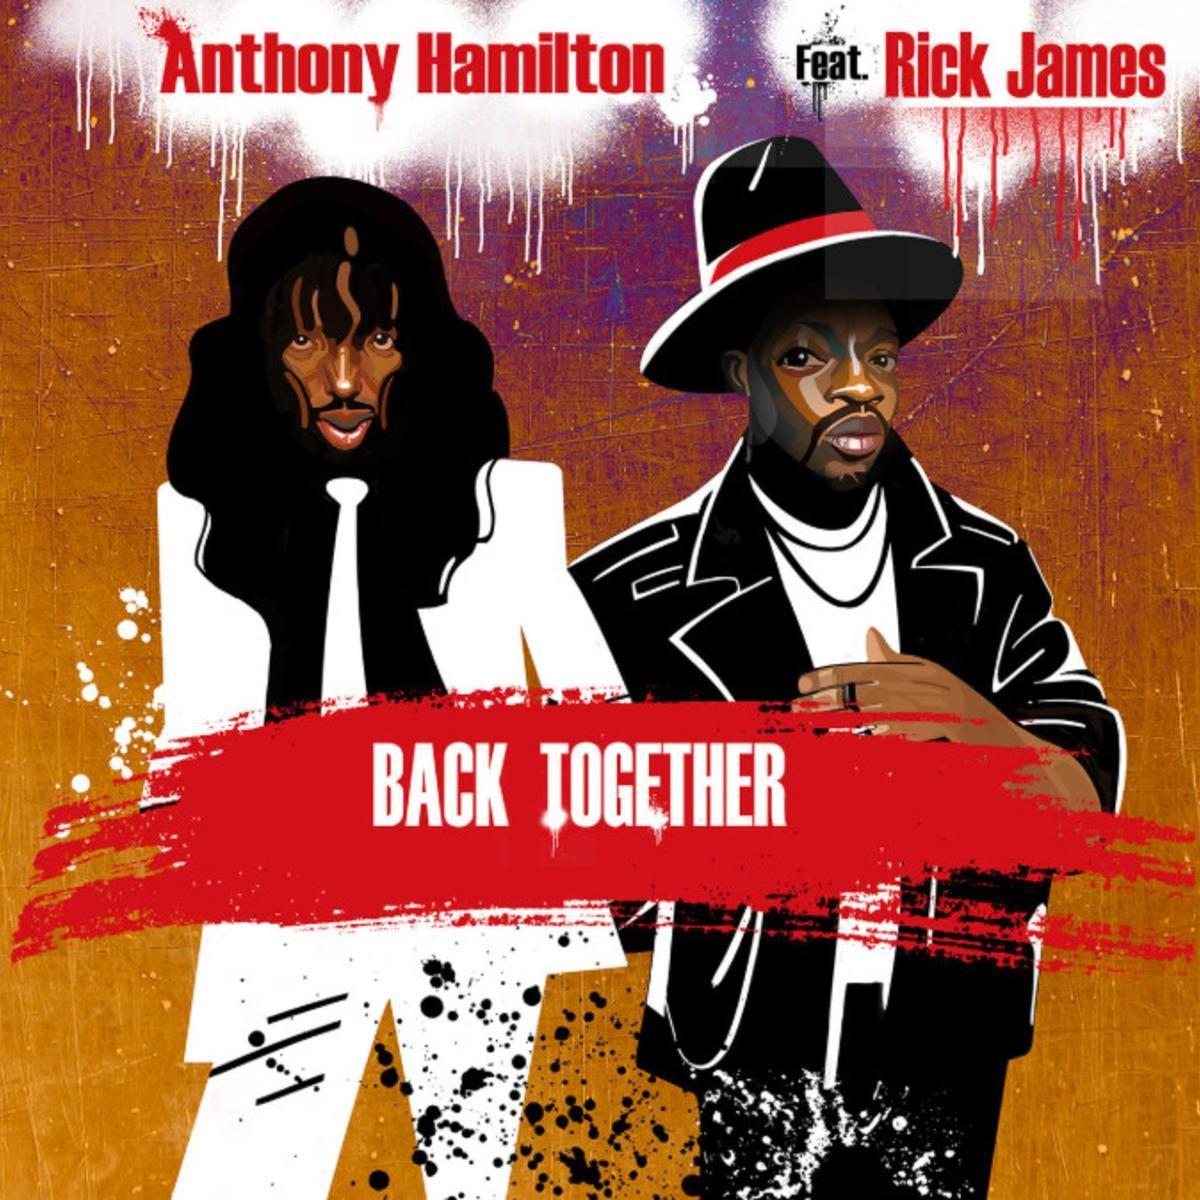 Back Together Anthony Hamilton Ft. Rick James in 2020